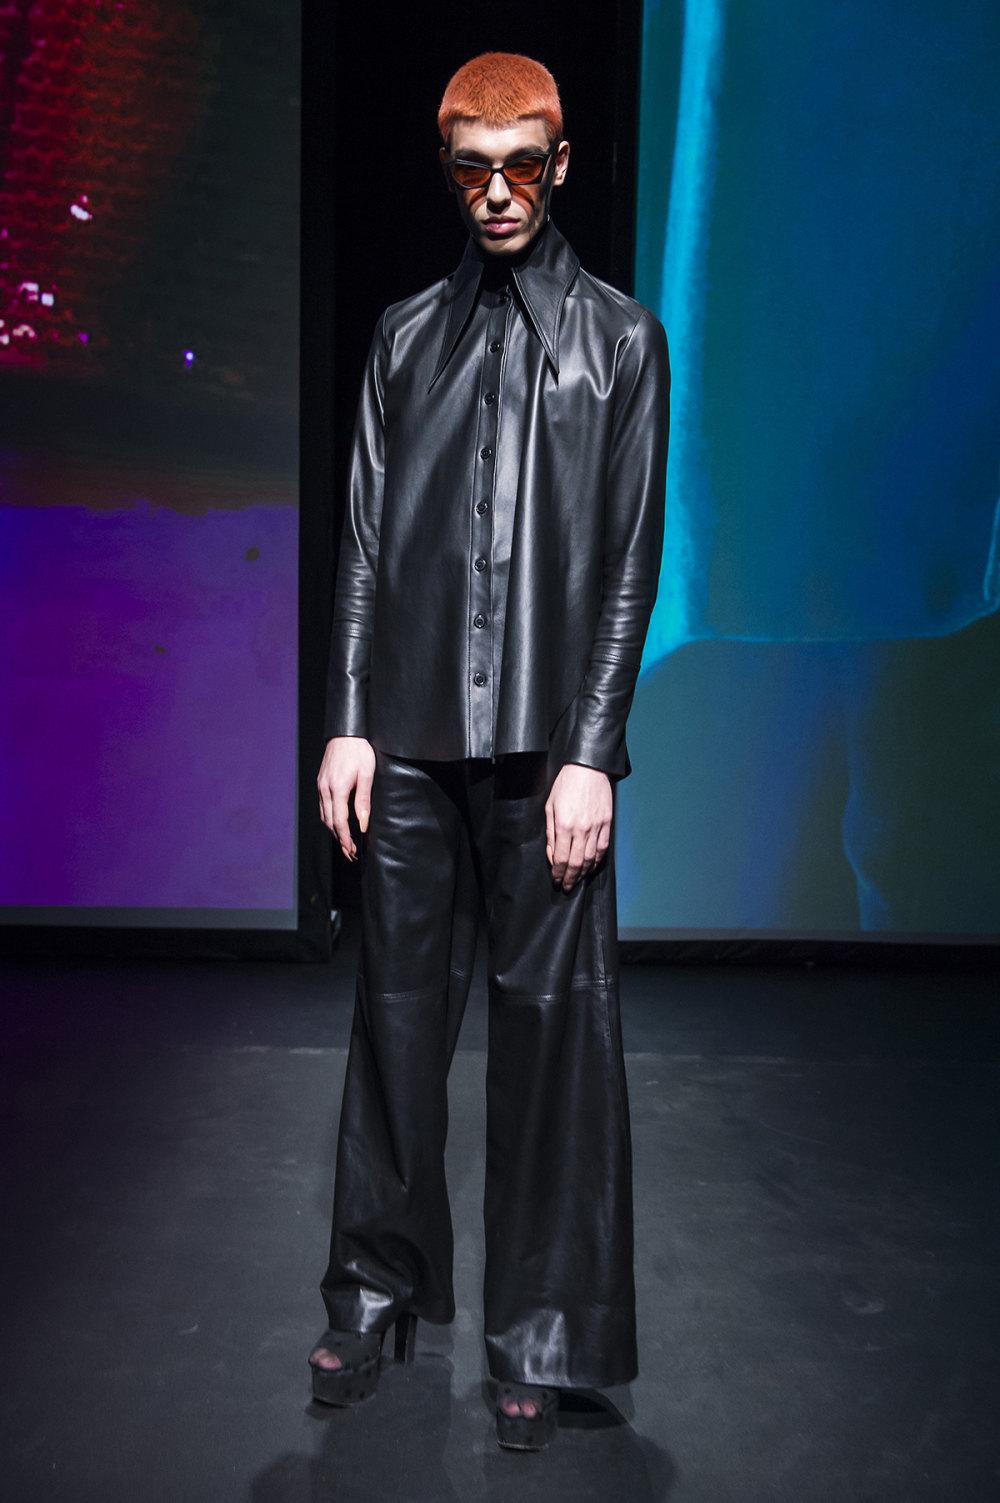 16Arlington时装系列标志性的時尚单色西装外还有更大胆的版本-3.jpg